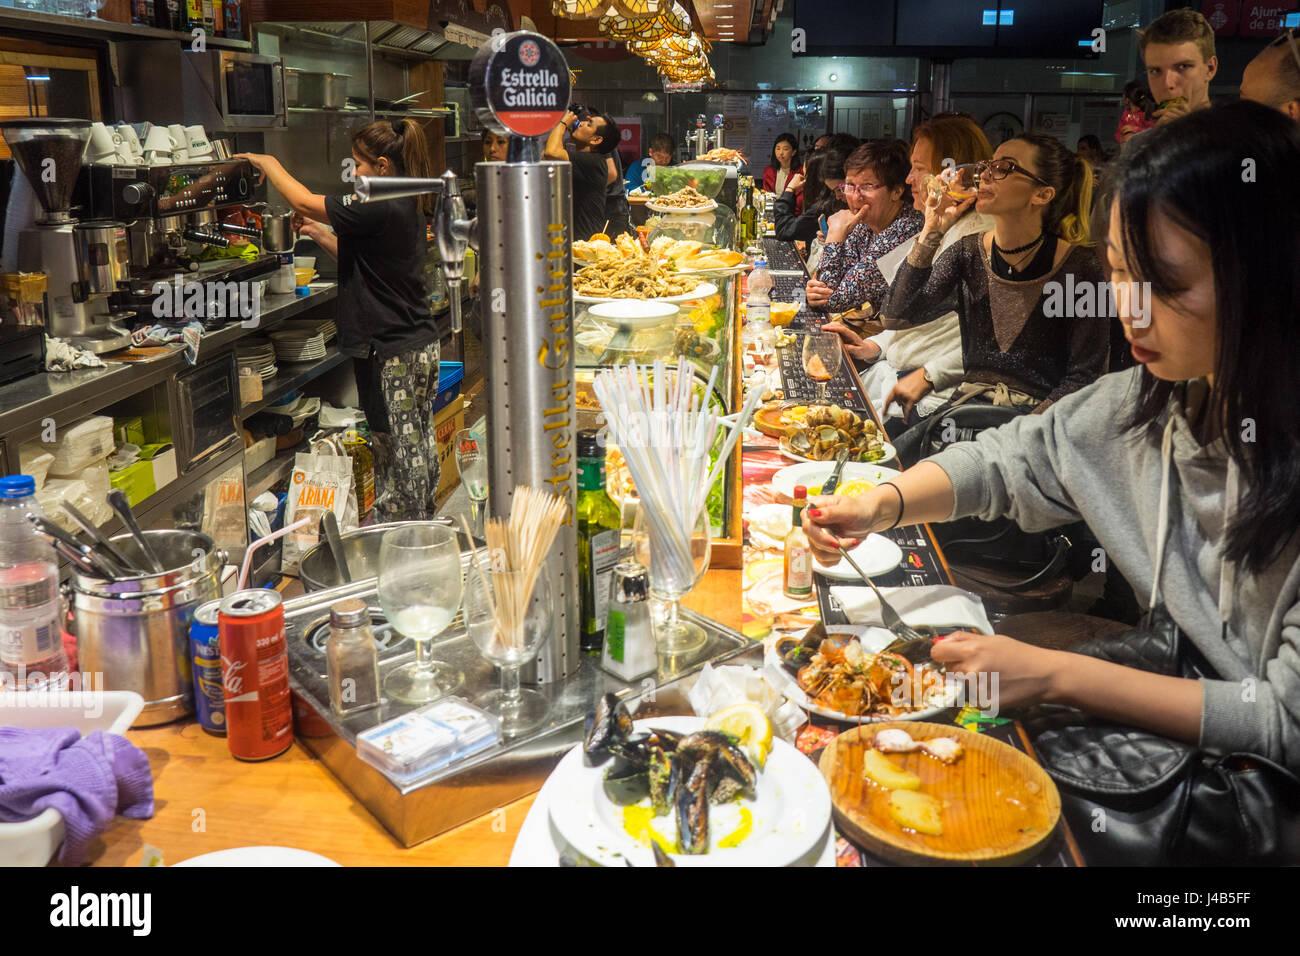 People sitting at the bar eating seafood tapas in Mercat de Sant Josep de la Boqueria, Barcelona Spain. - Stock Image